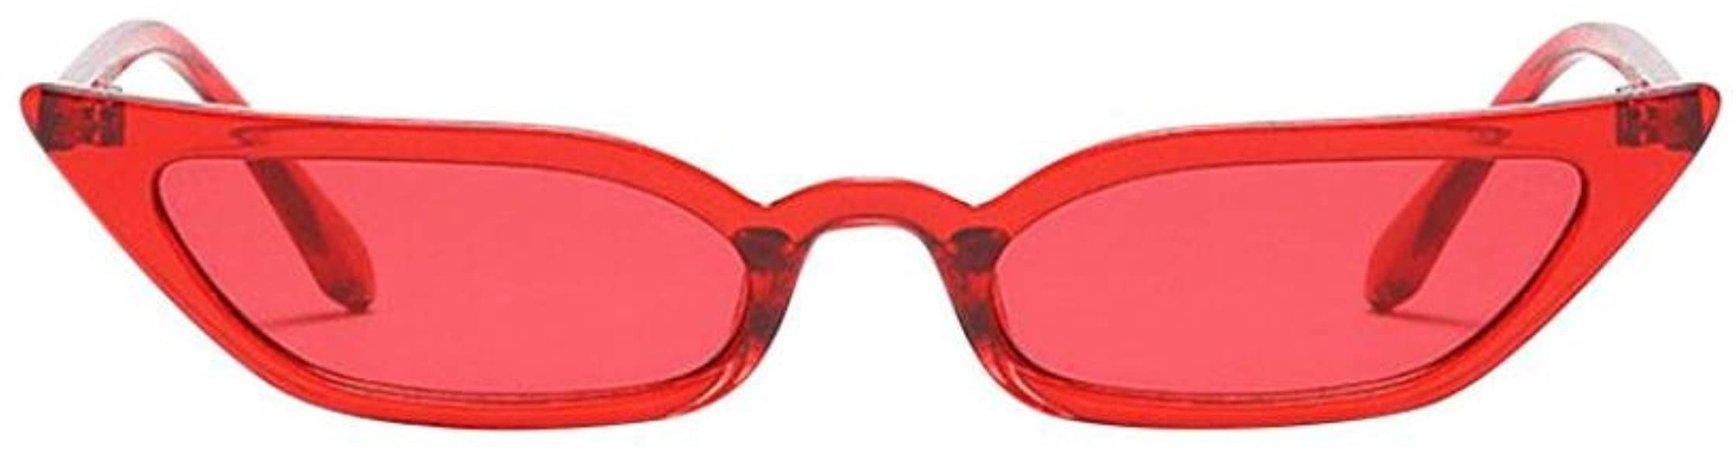 JoyJay Women Vintage Retro Cat Eye Sunglasses Retro Small Frame UV400 Eyewear Fashion (Red): Amazon.co.uk: Clothing